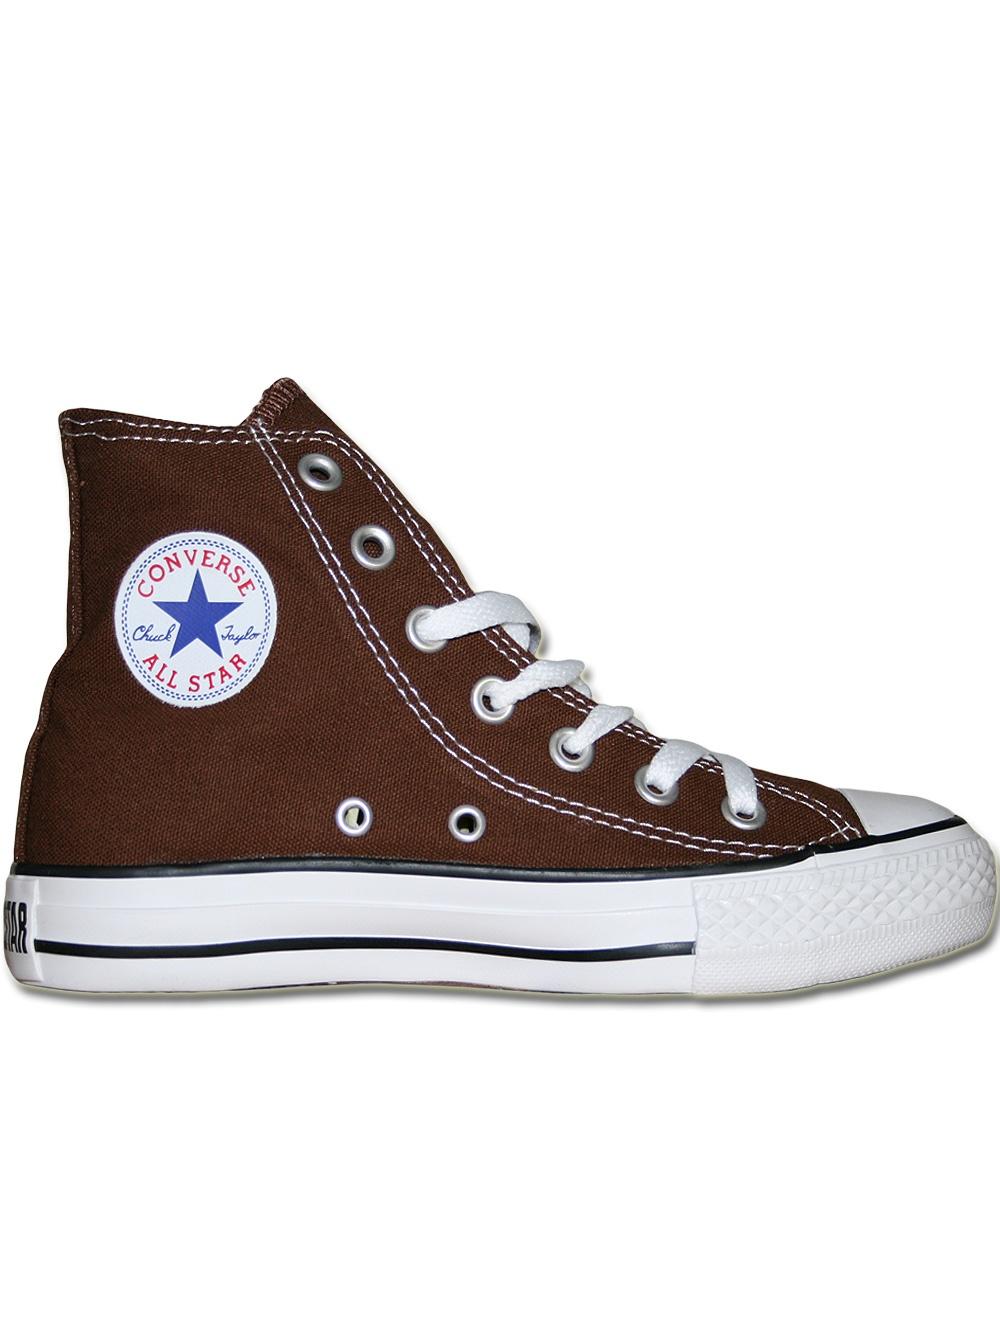 converse chucks all star converse 5776 schuhe g nstig. Black Bedroom Furniture Sets. Home Design Ideas